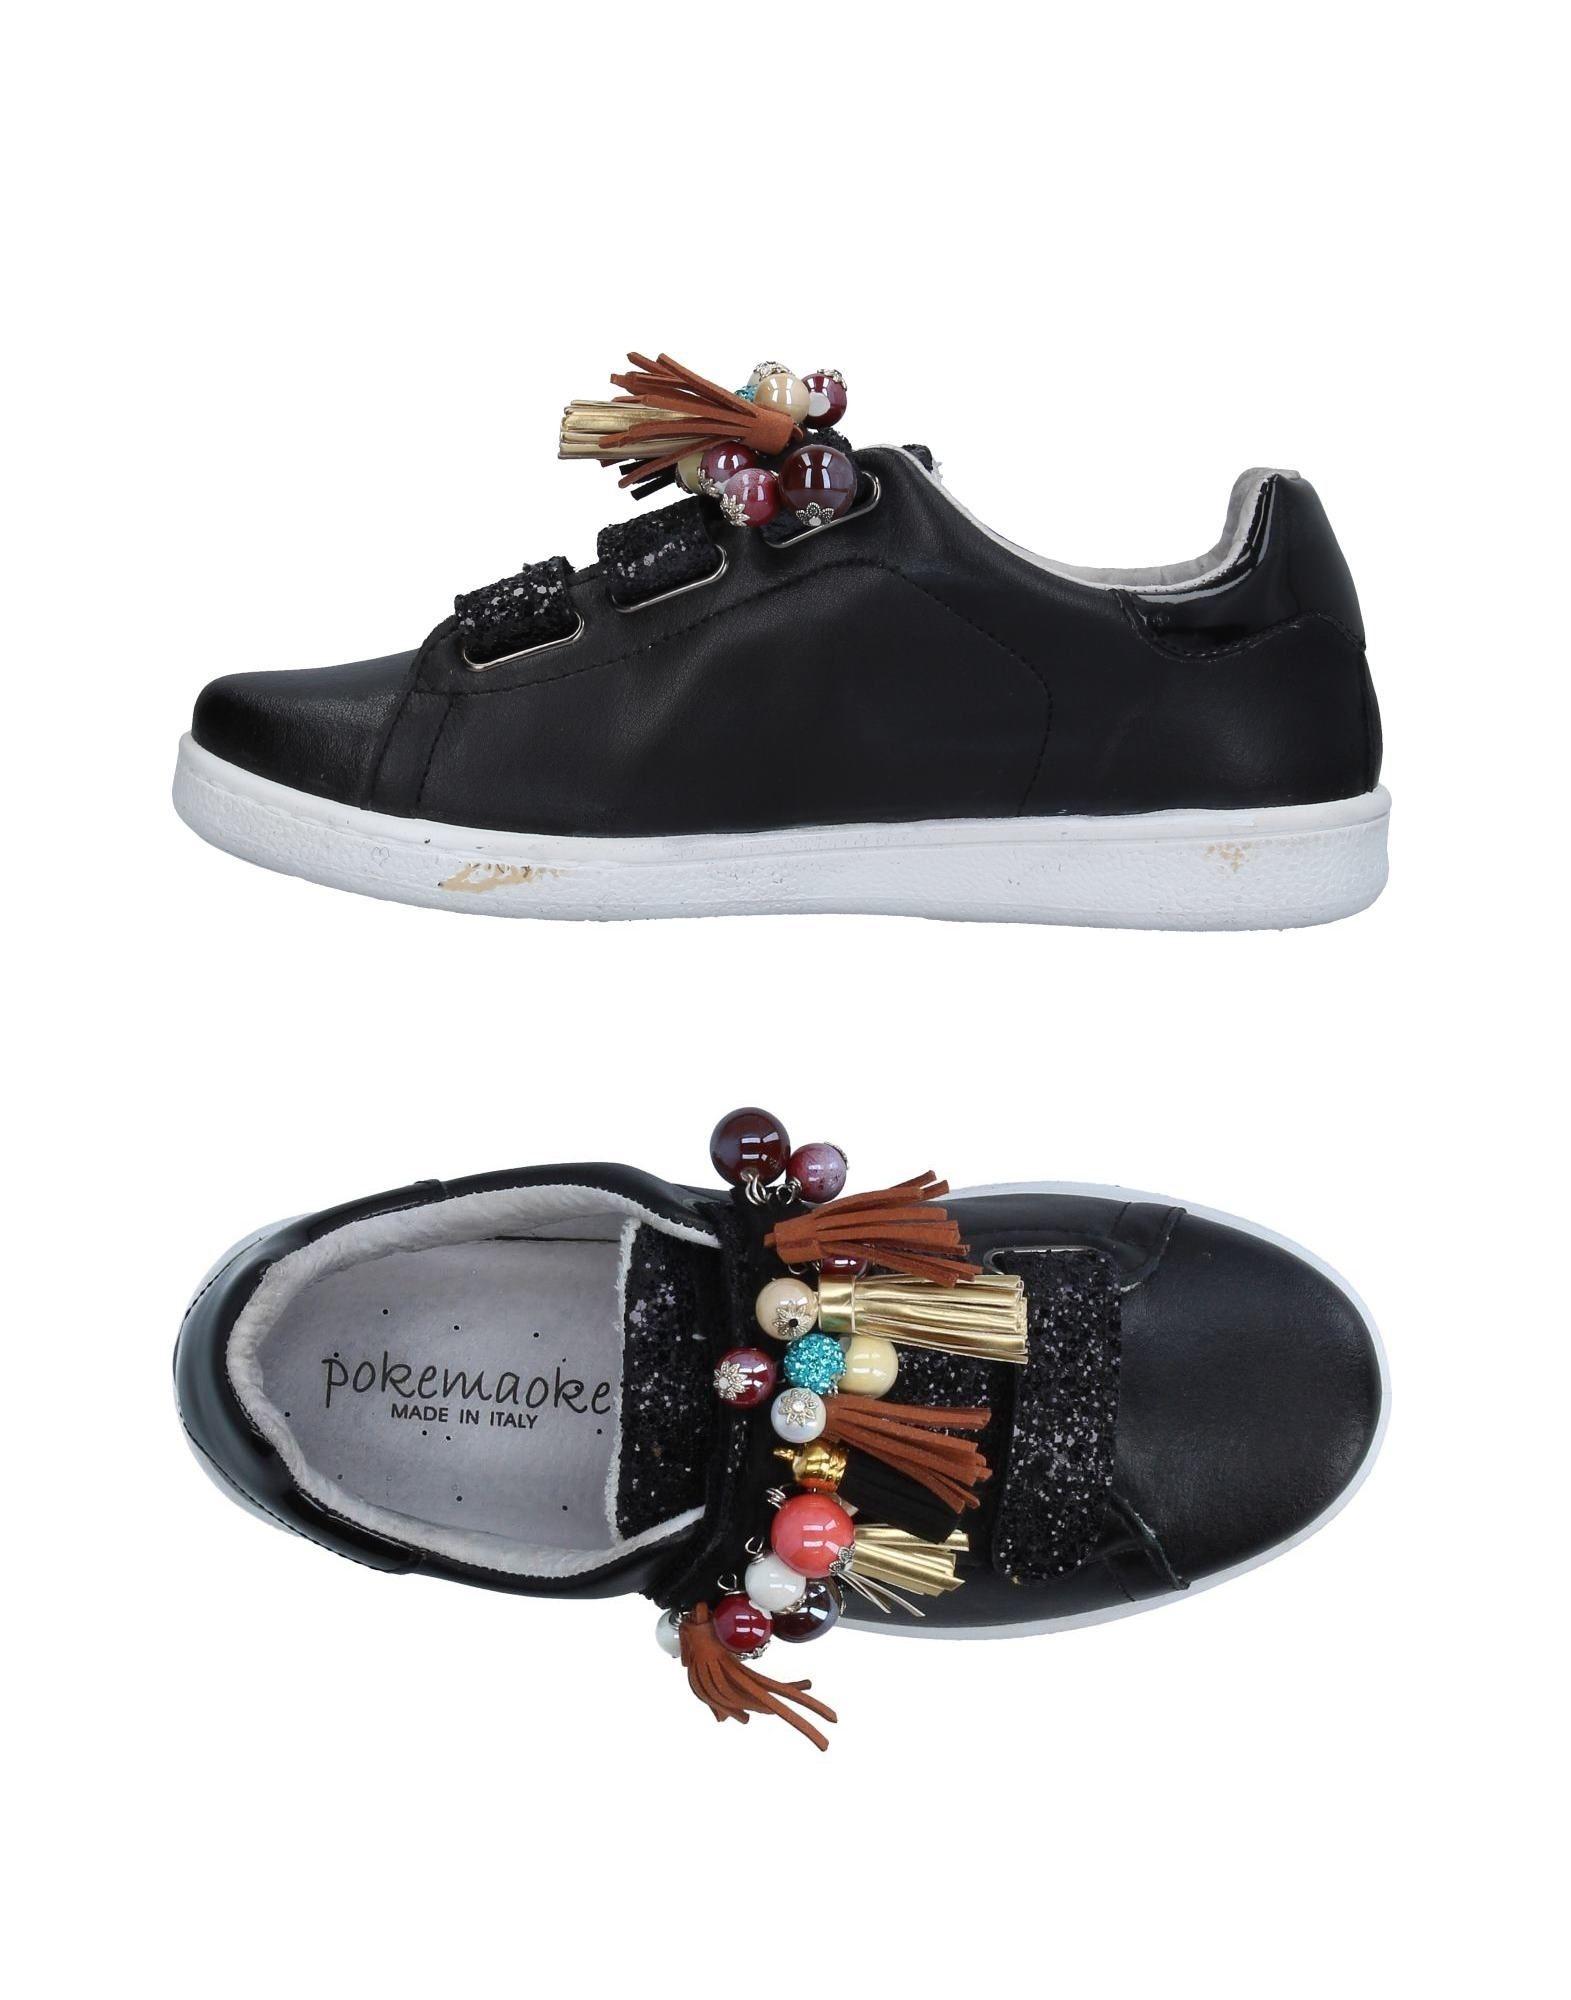 Moda Sneakers Sneakers Moda Pokemaoke Donna - 11286376KX ab5966